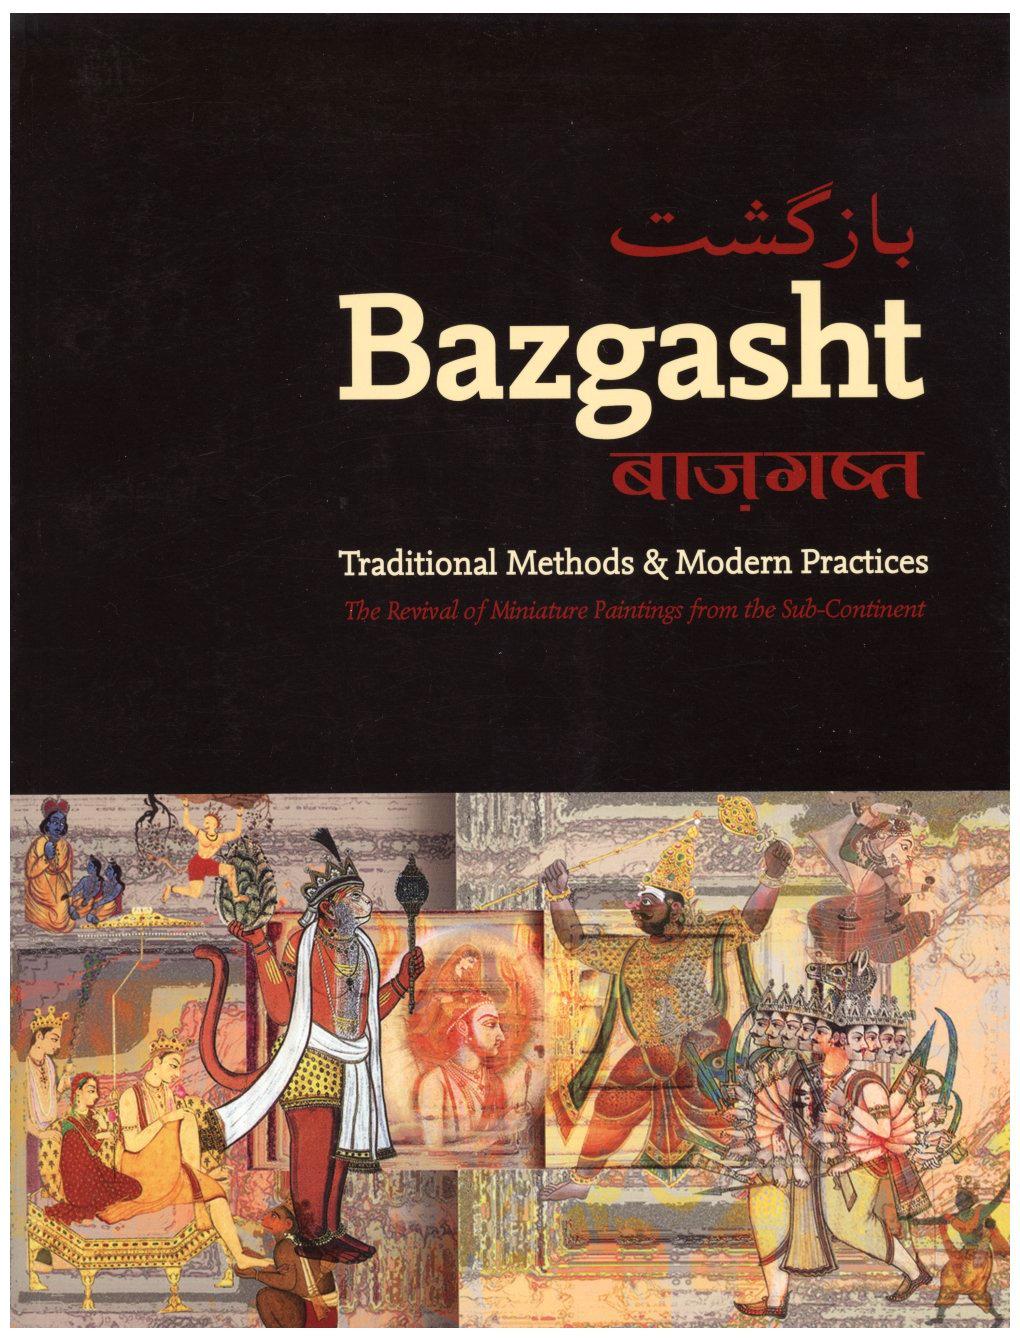 Bazgasht: Traditional Methods & Modern Practices   Khan, Adil Ali; Mahmood, Asma Arshad. Art Gallery of Mississauga. Mississauga, 2009.  www.artgalleryofmississauga.com/